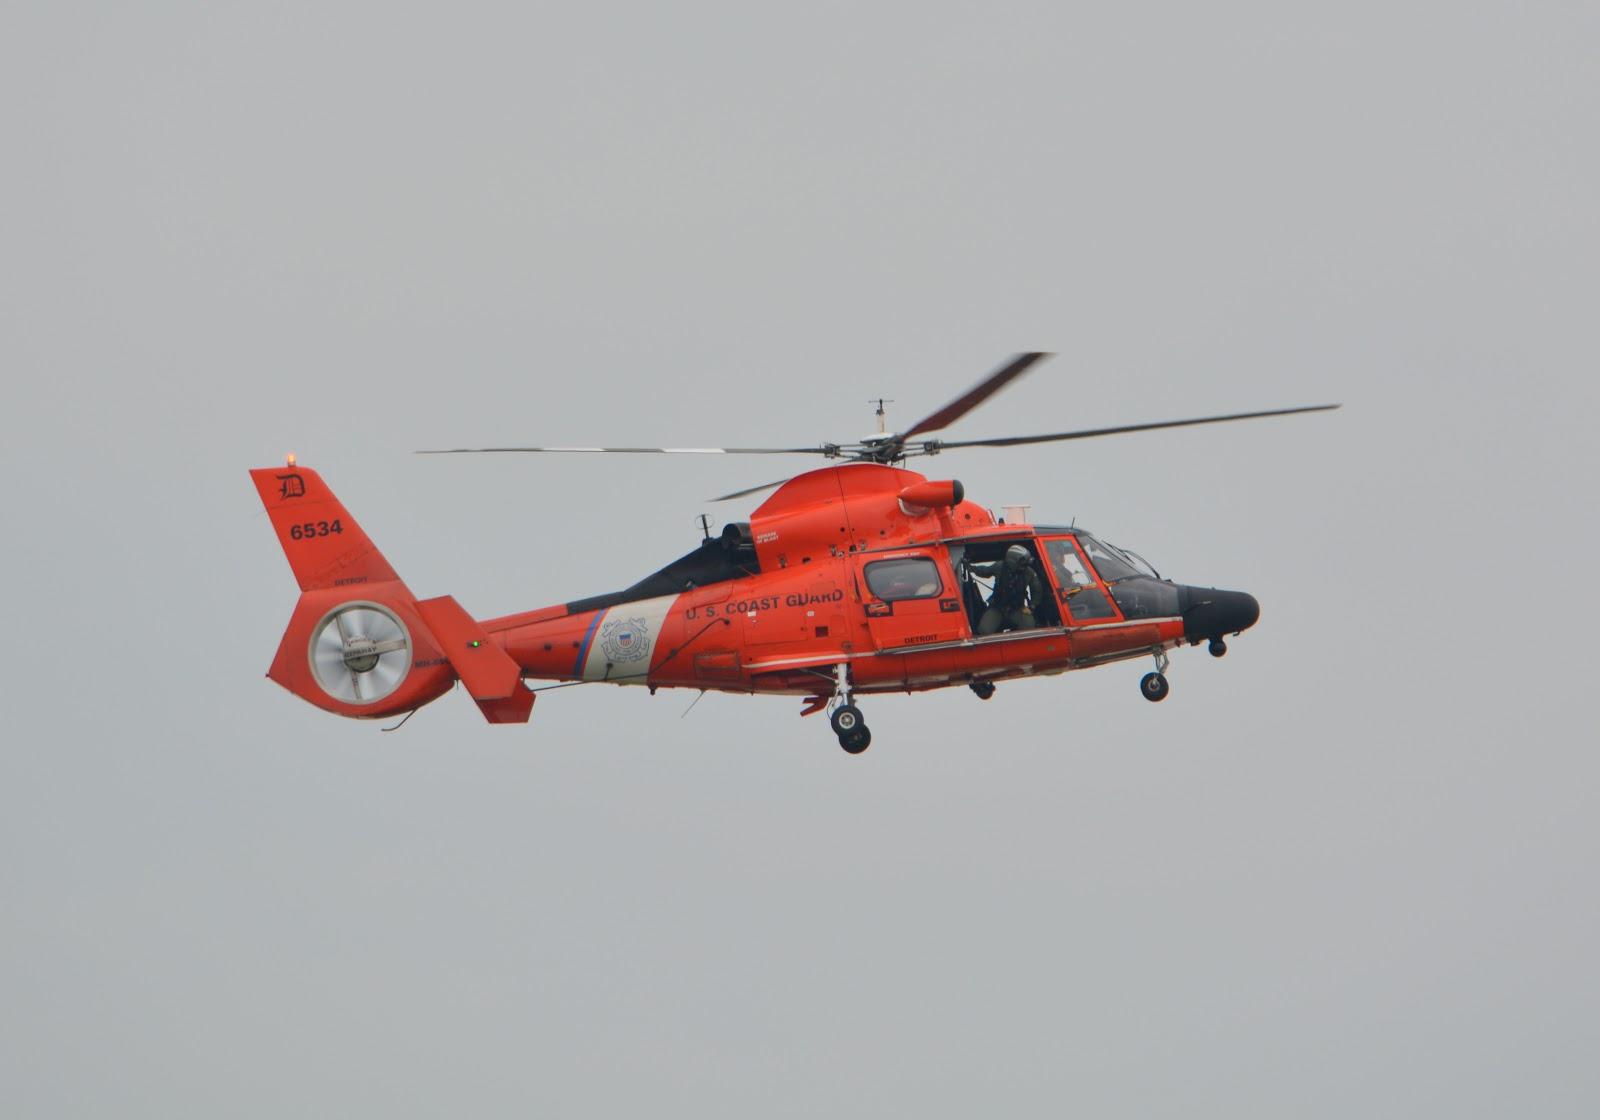 cozy birdhouse | dayton air show 2014, coast guard helicopter